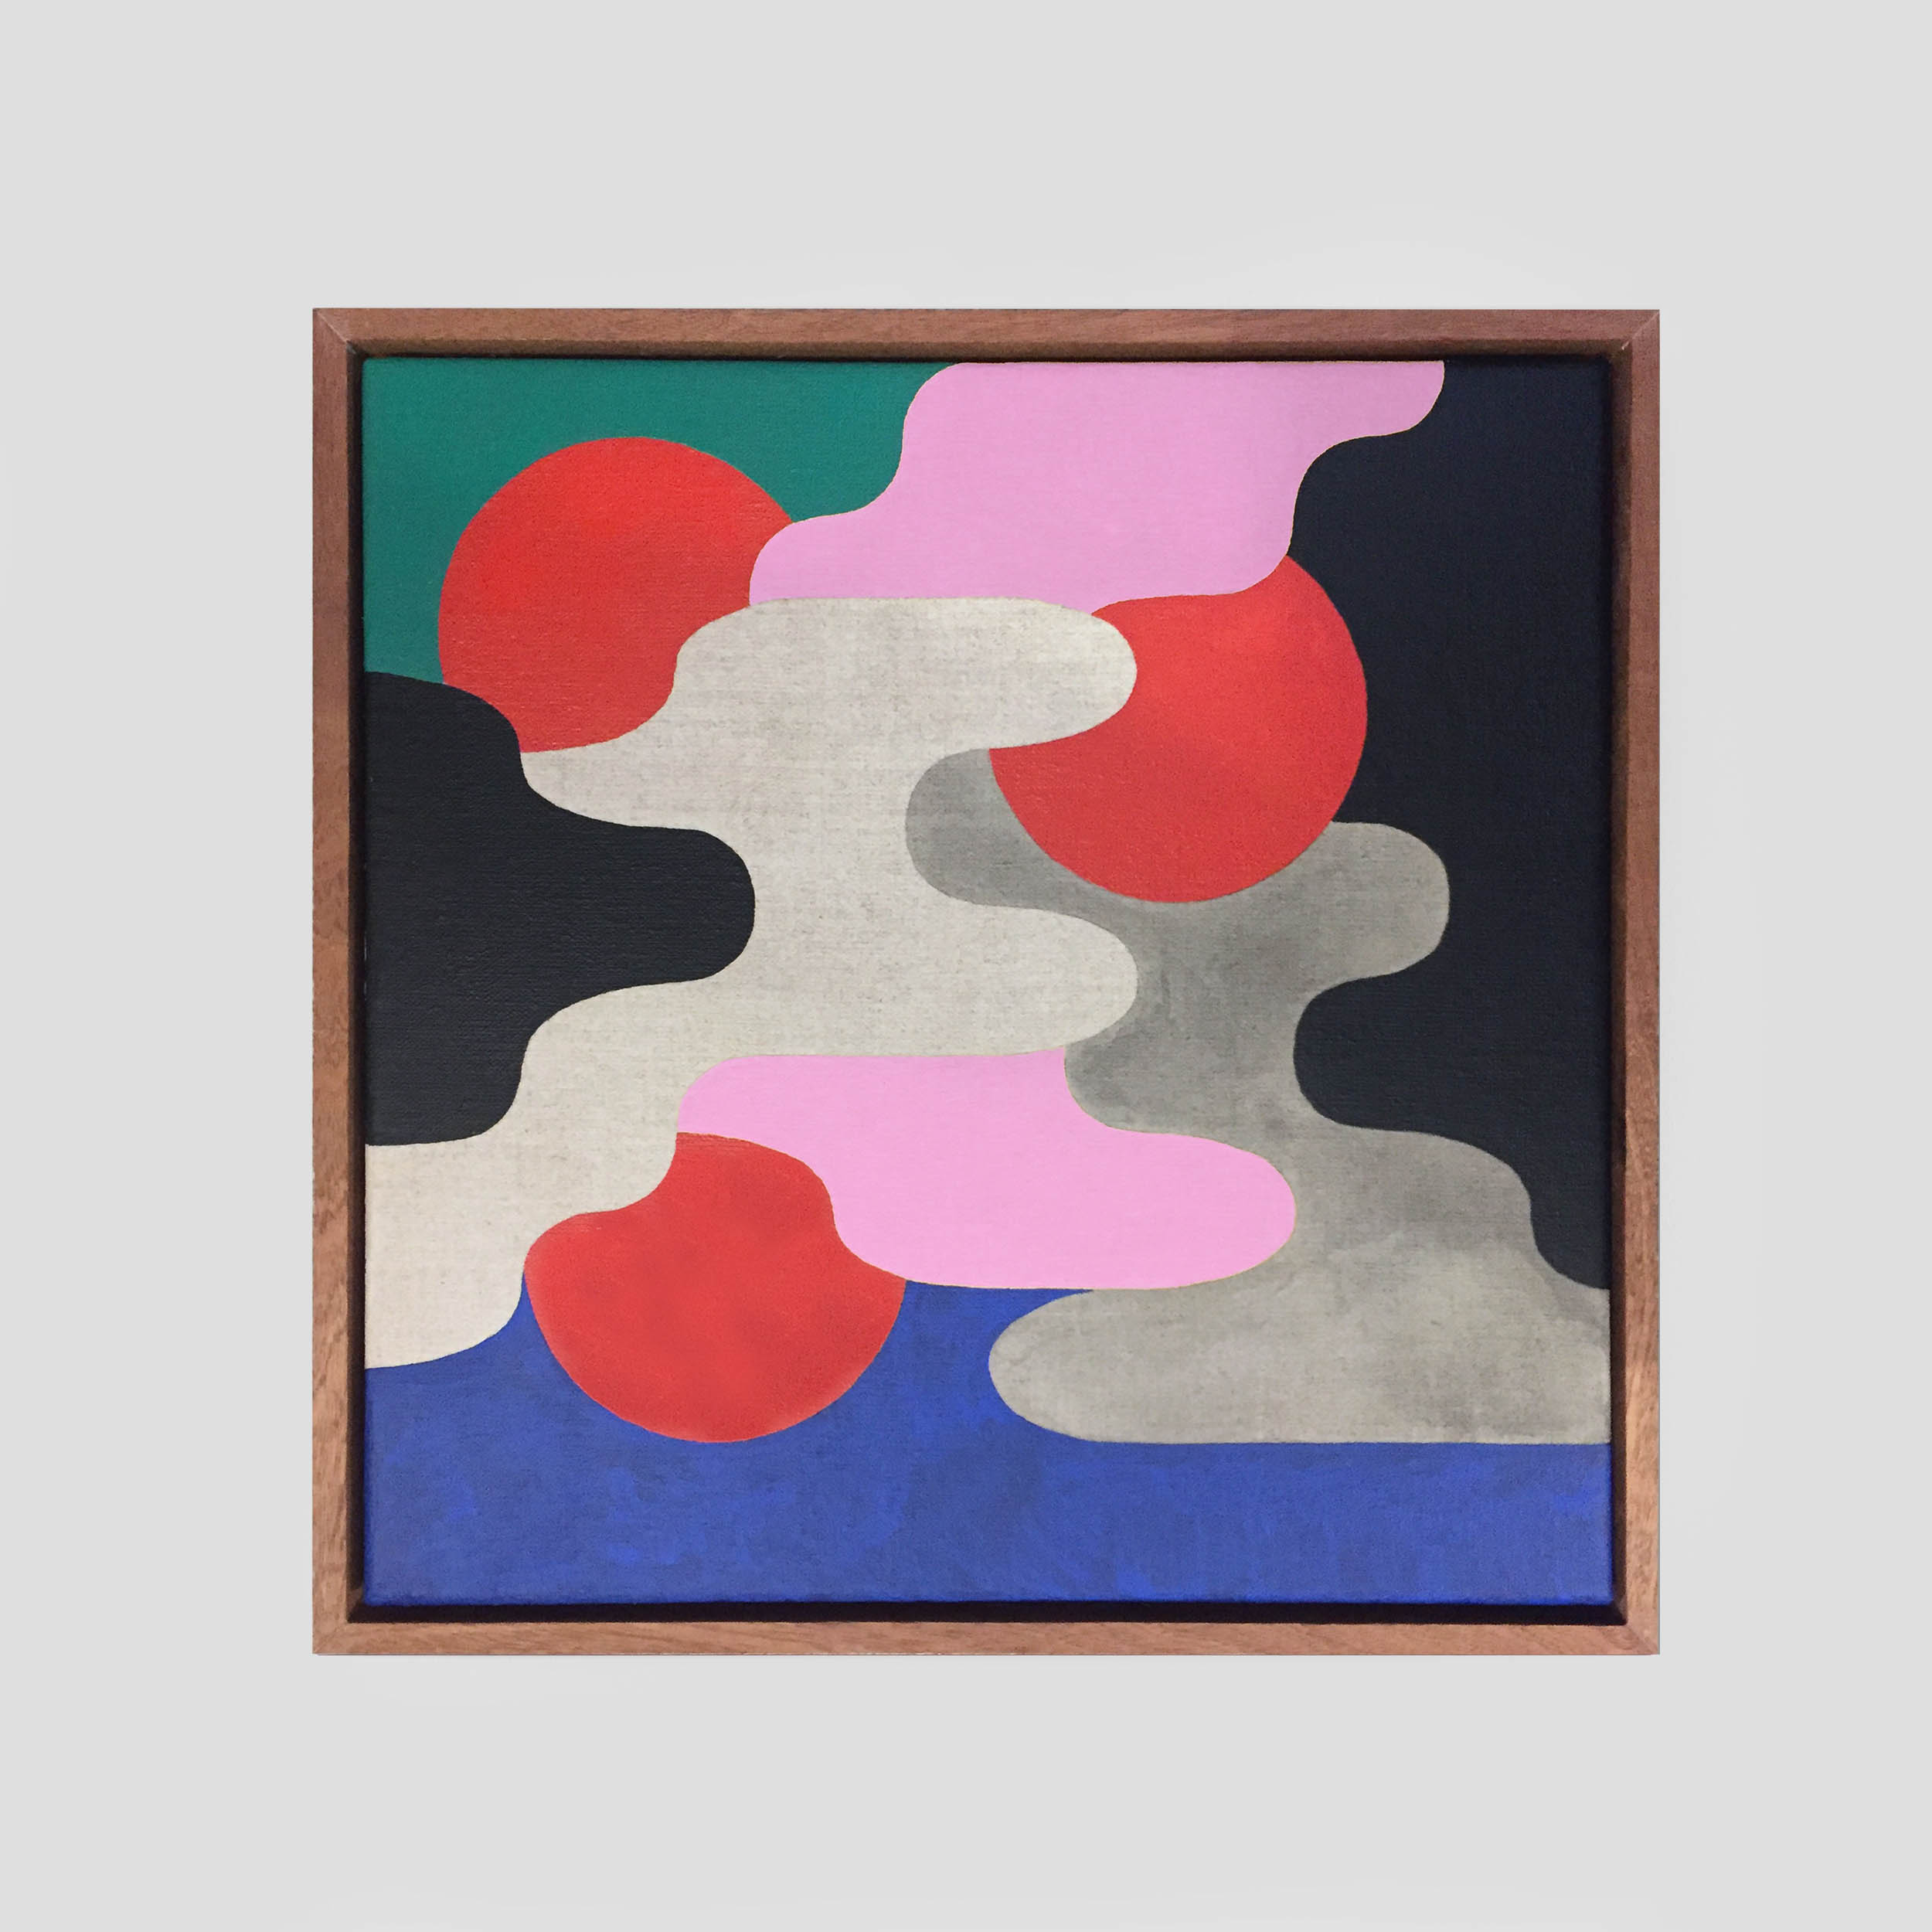 Coriolis   41 x 41 cm | acrylic on linen, sapele frame | 2018